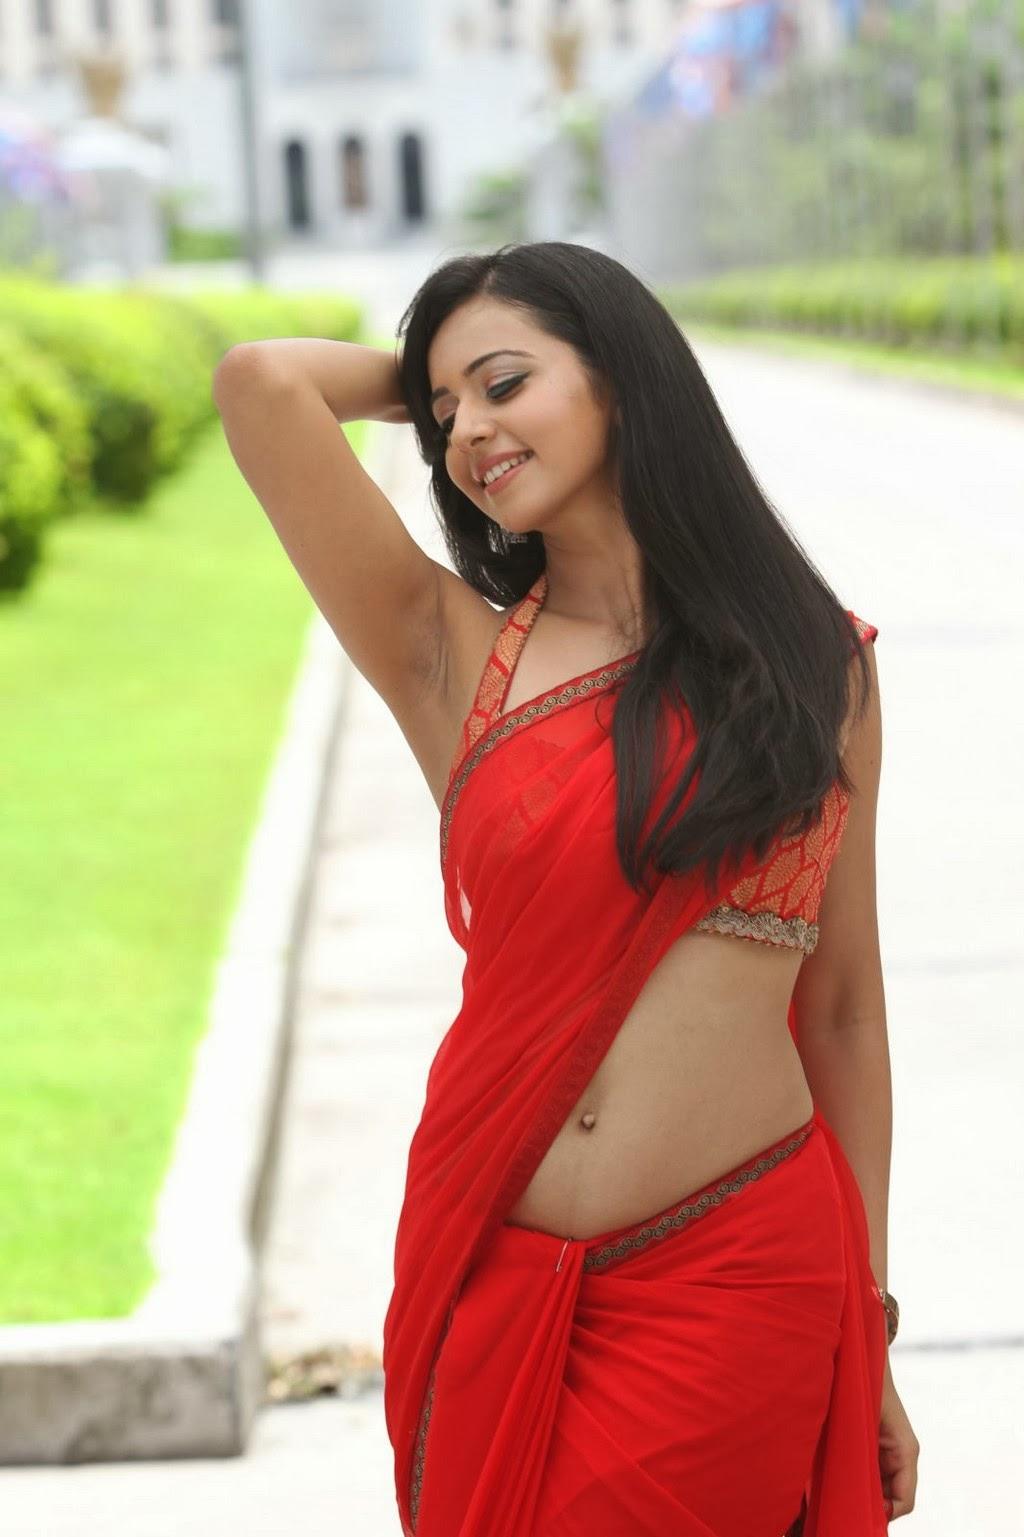 Rakul Preet Singh Hot Navel and Thighs Show Photos | HQ ...